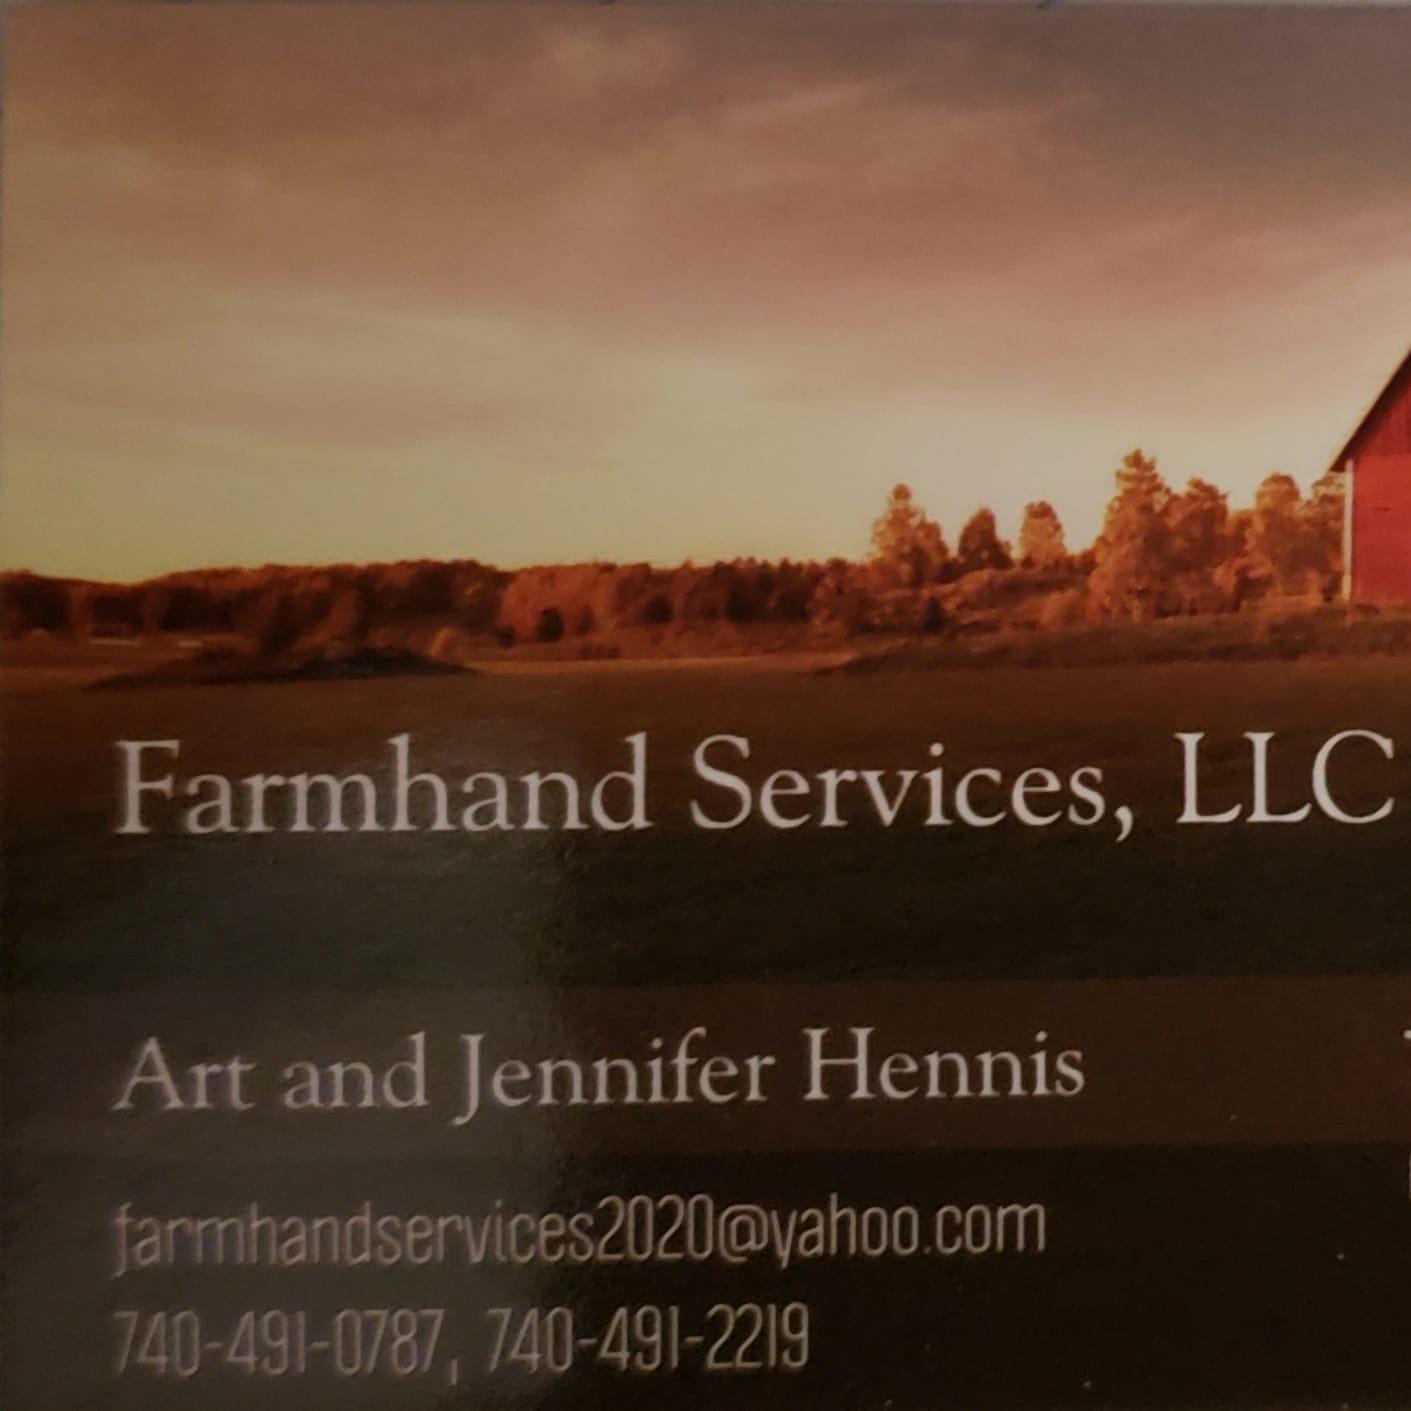 Farmhand Services, LLC